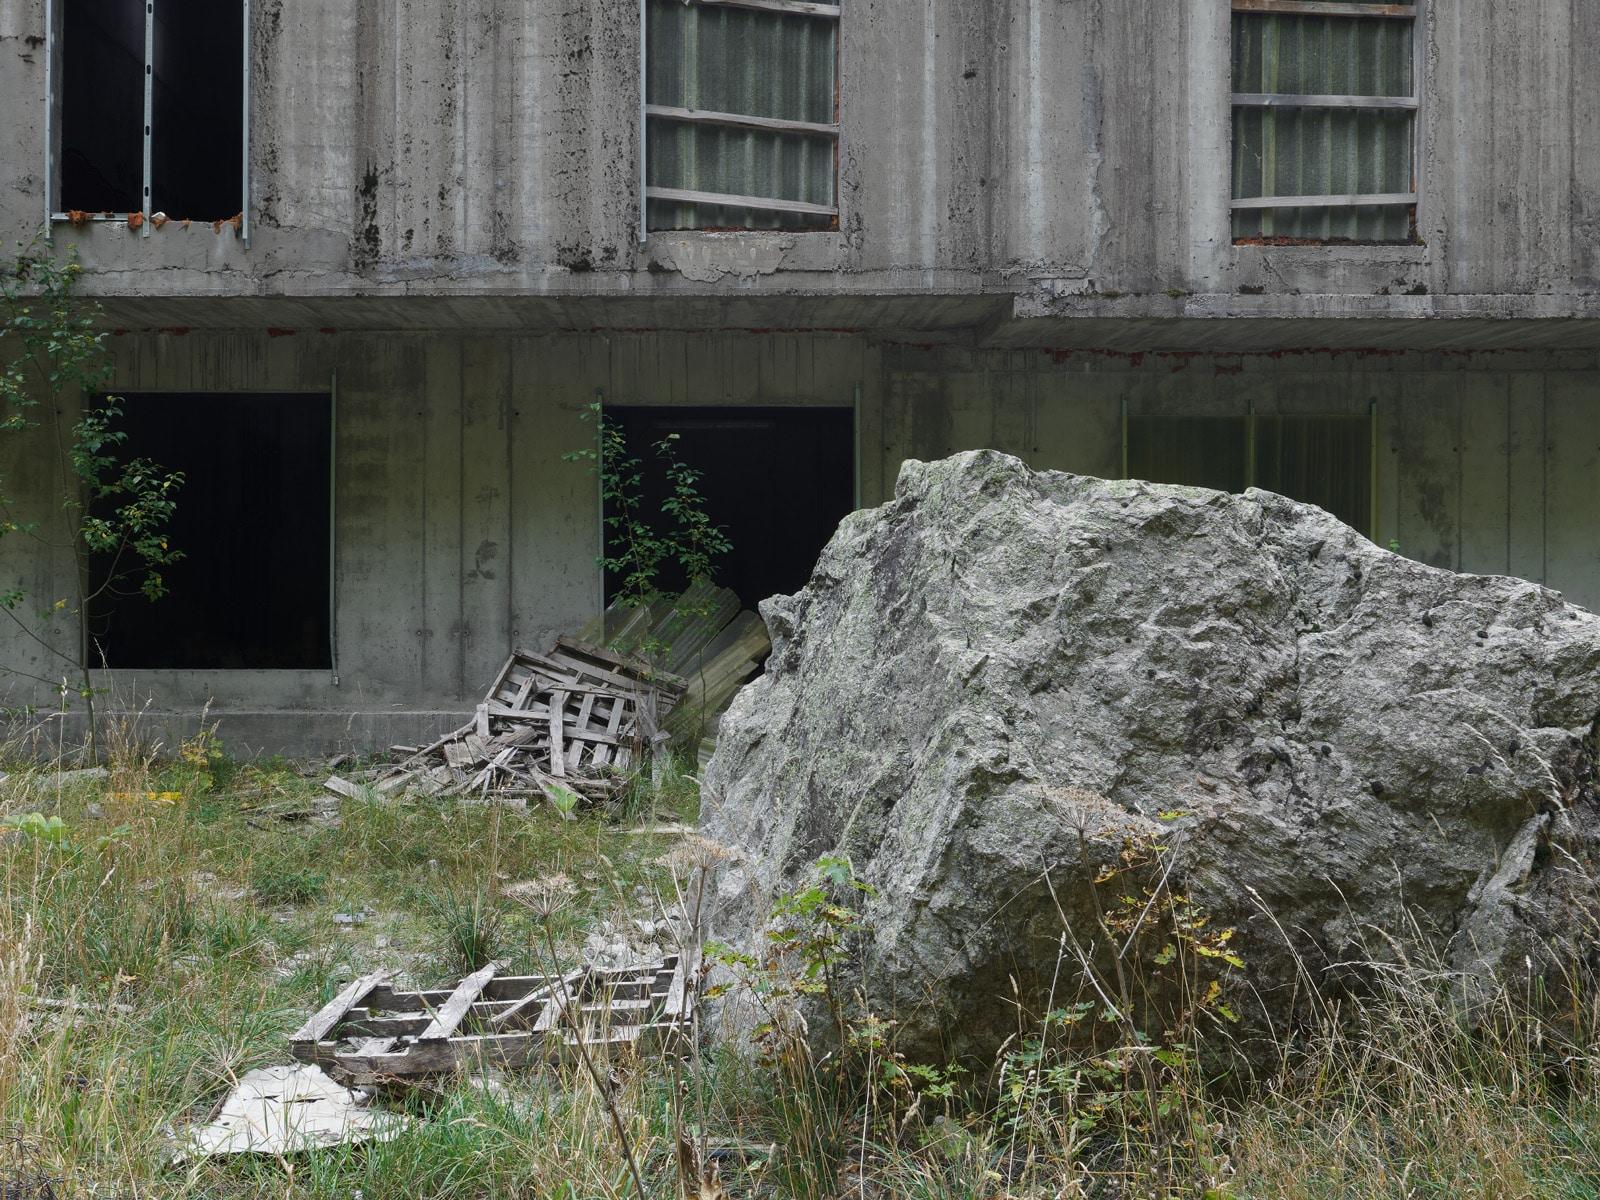 Poetics of Abandonment  - 20210918 InakiBergera Panticosa 7 48